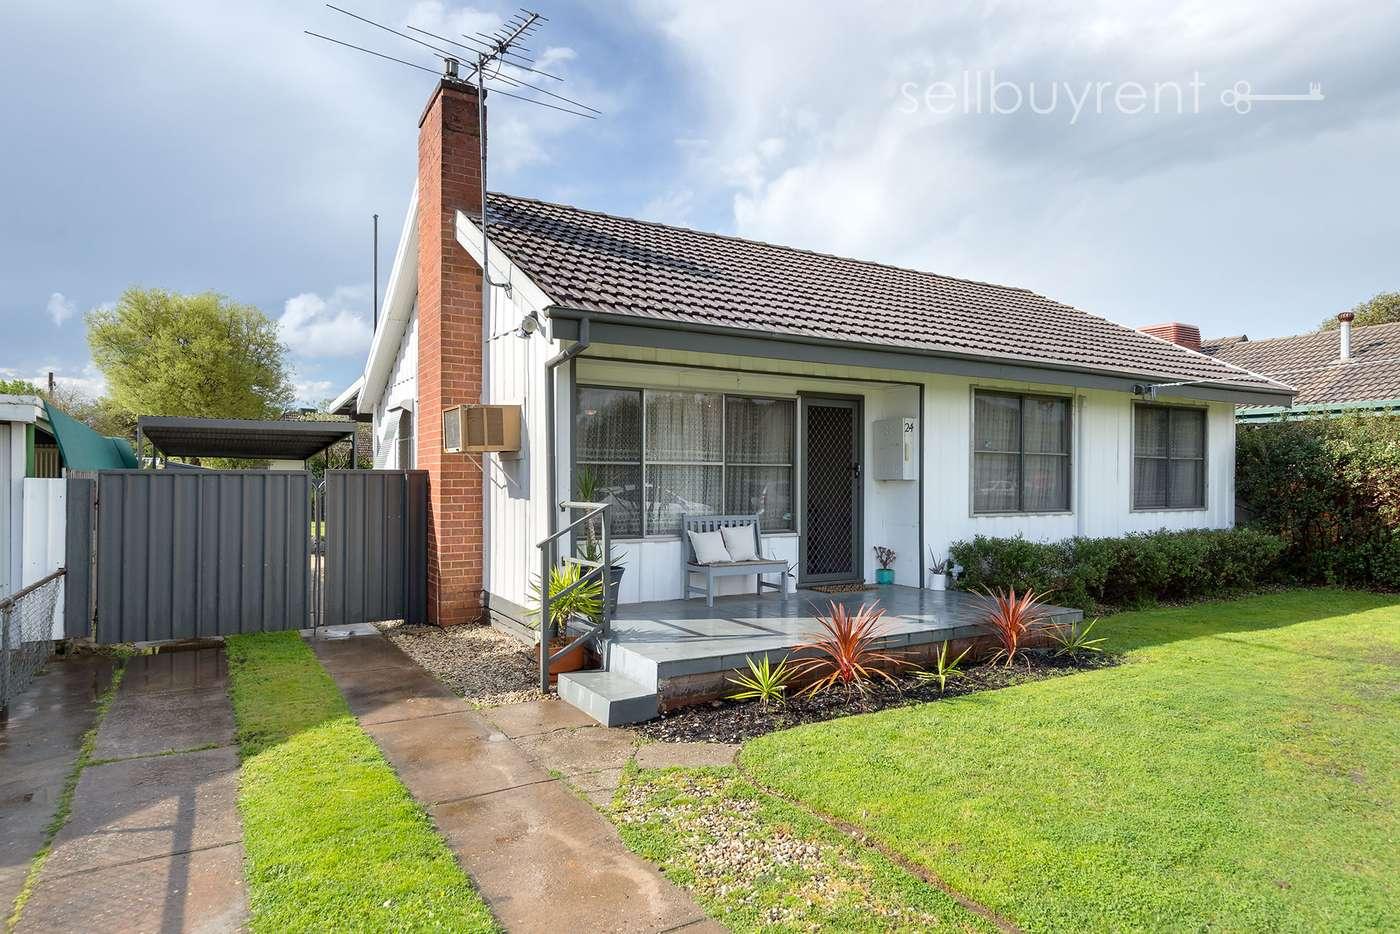 Main view of Homely house listing, 24 PEARCE STREET, Wodonga VIC 3690